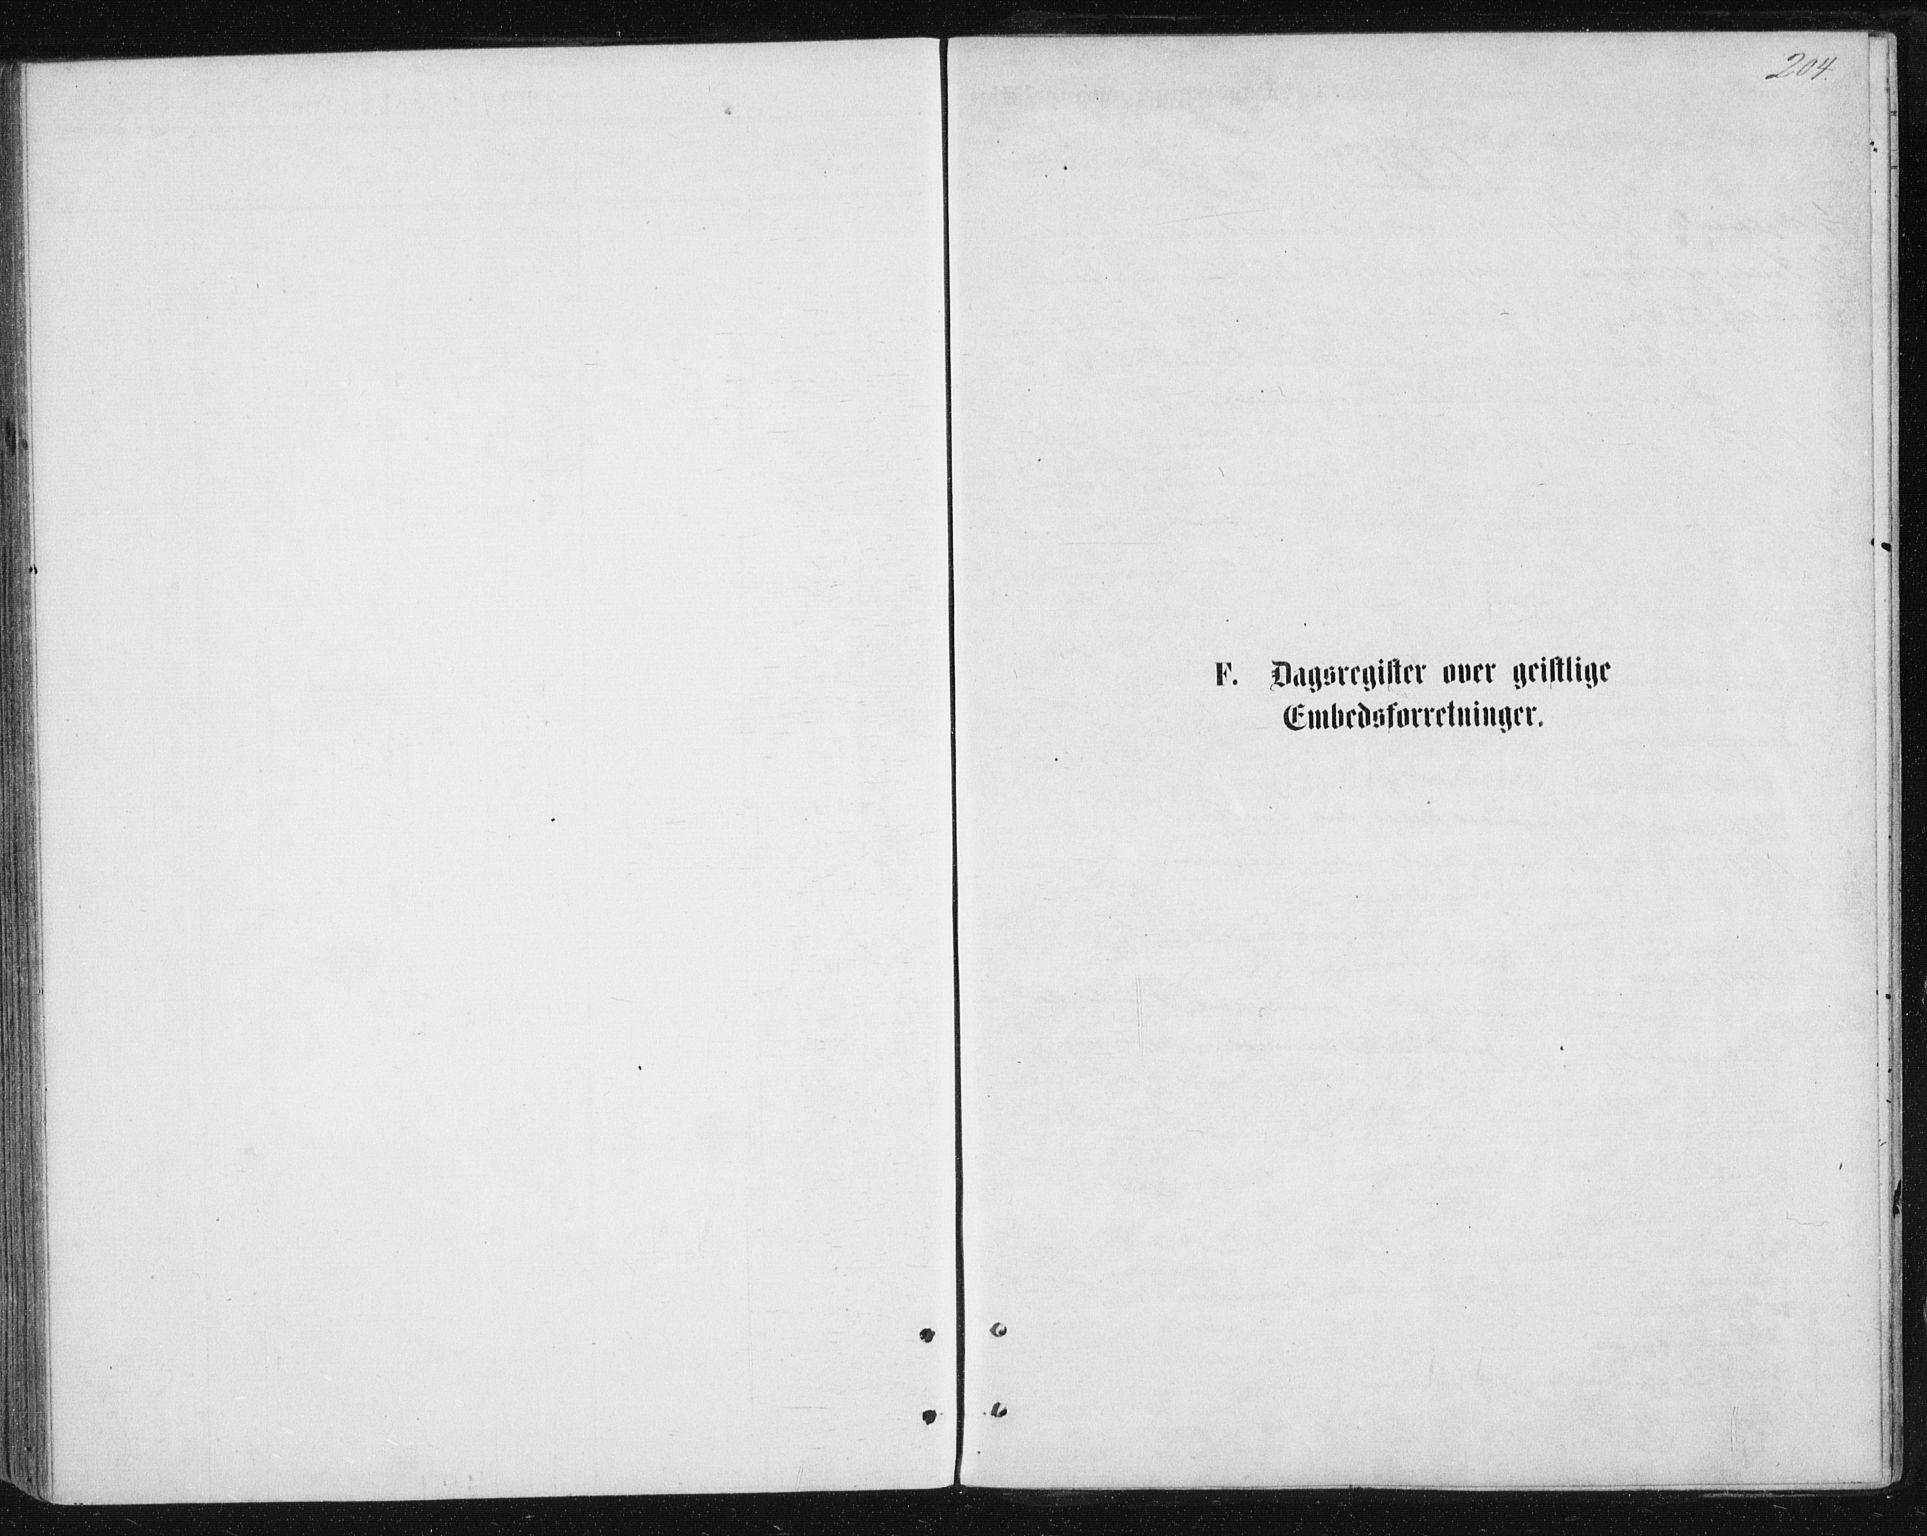 SAT, Ministerialprotokoller, klokkerbøker og fødselsregistre - Nordland, 888/L1243: Ministerialbok nr. 888A09, 1876-1879, s. 204